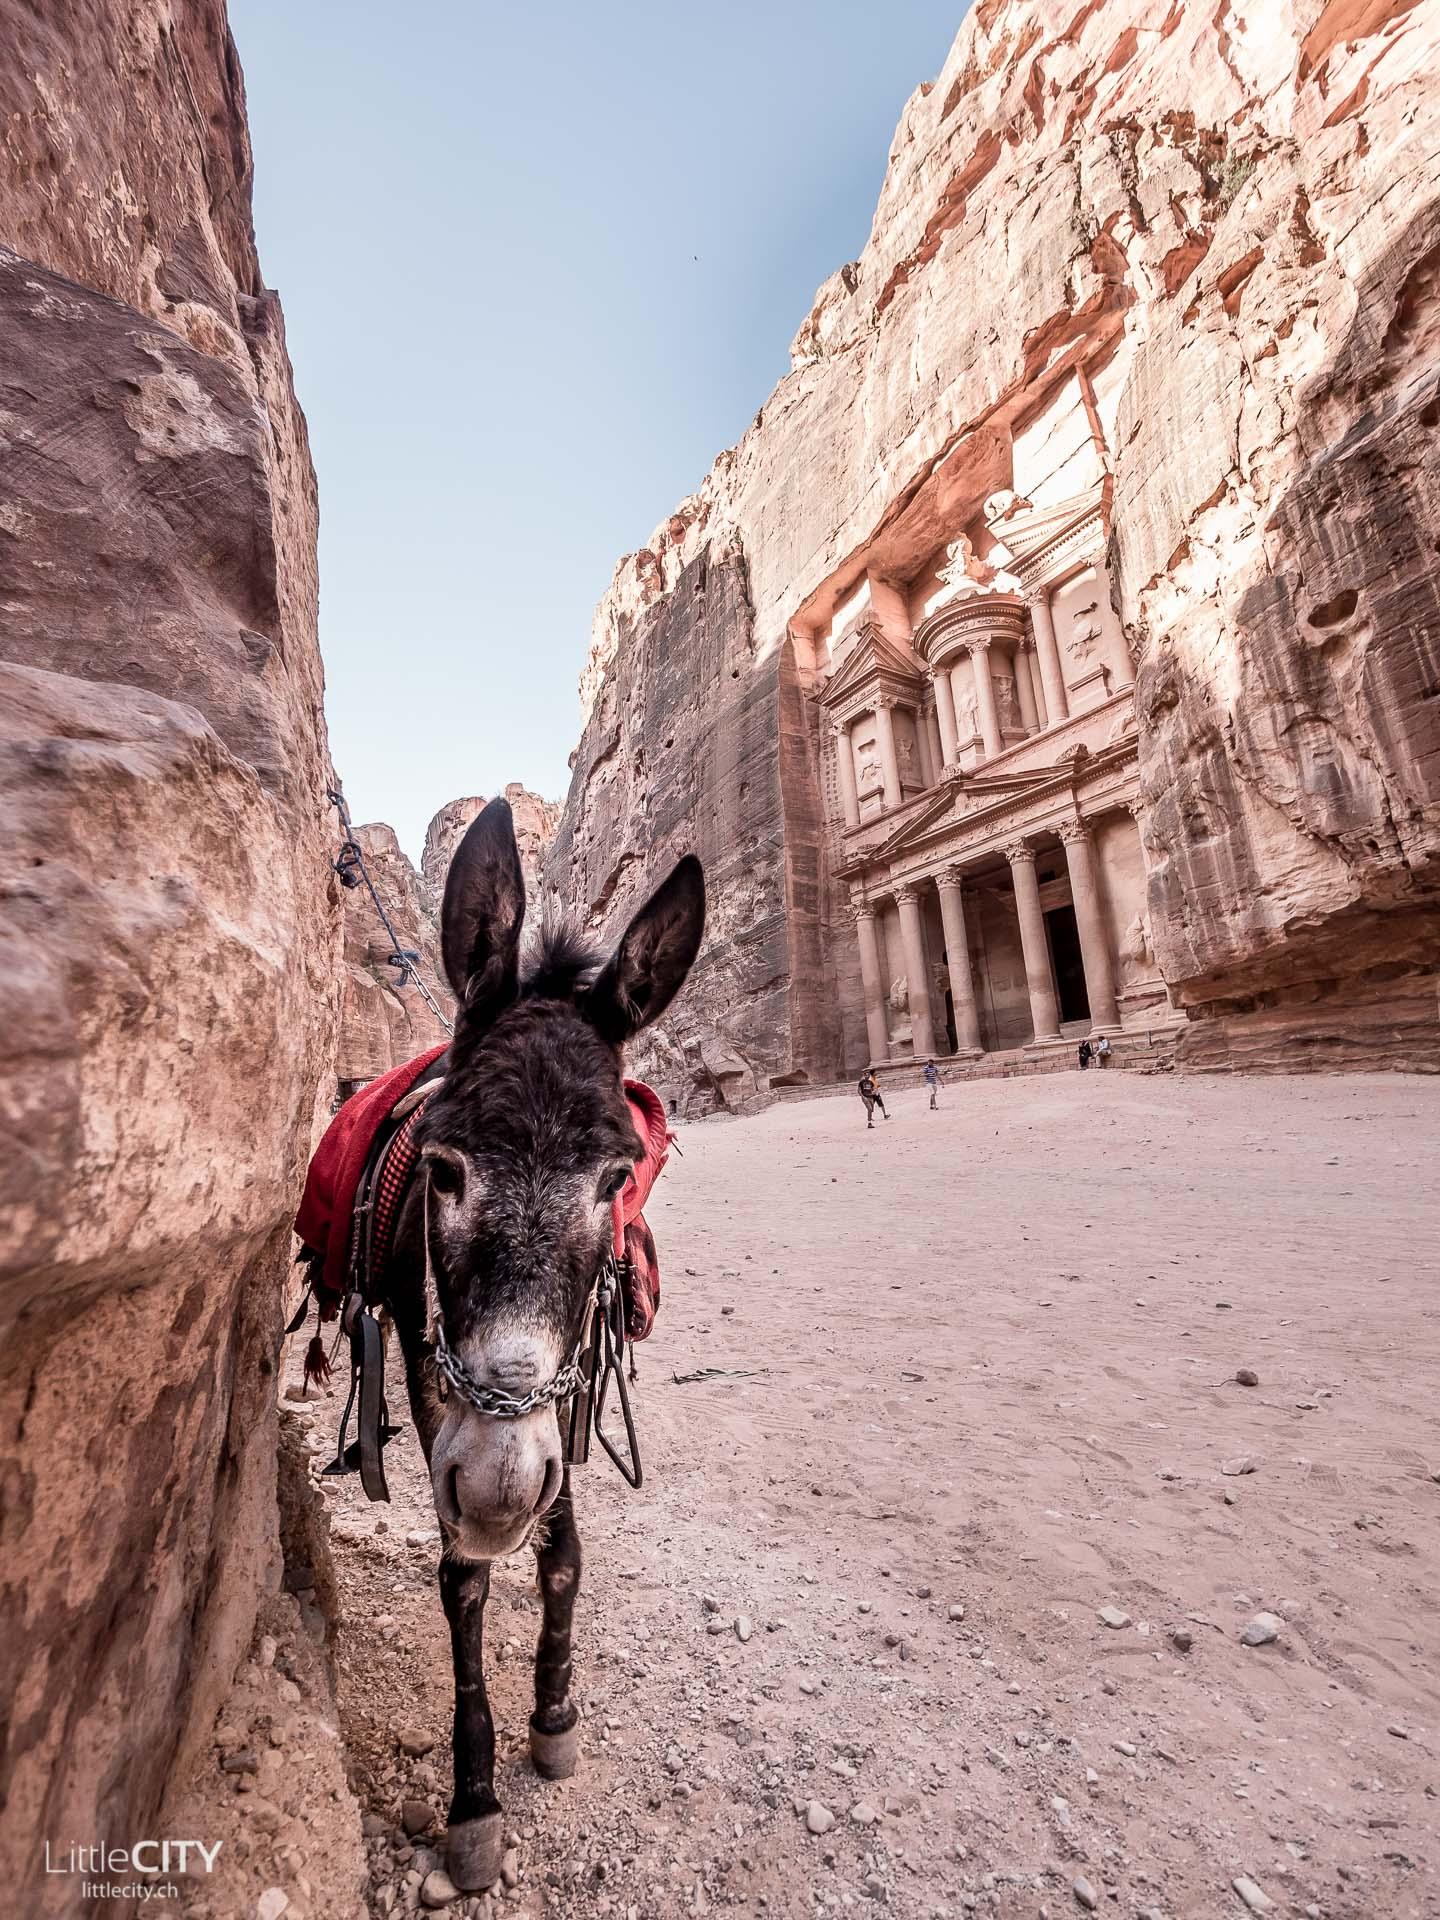 Petra Jordanien Reisetipp, Fakten, Bauwerke